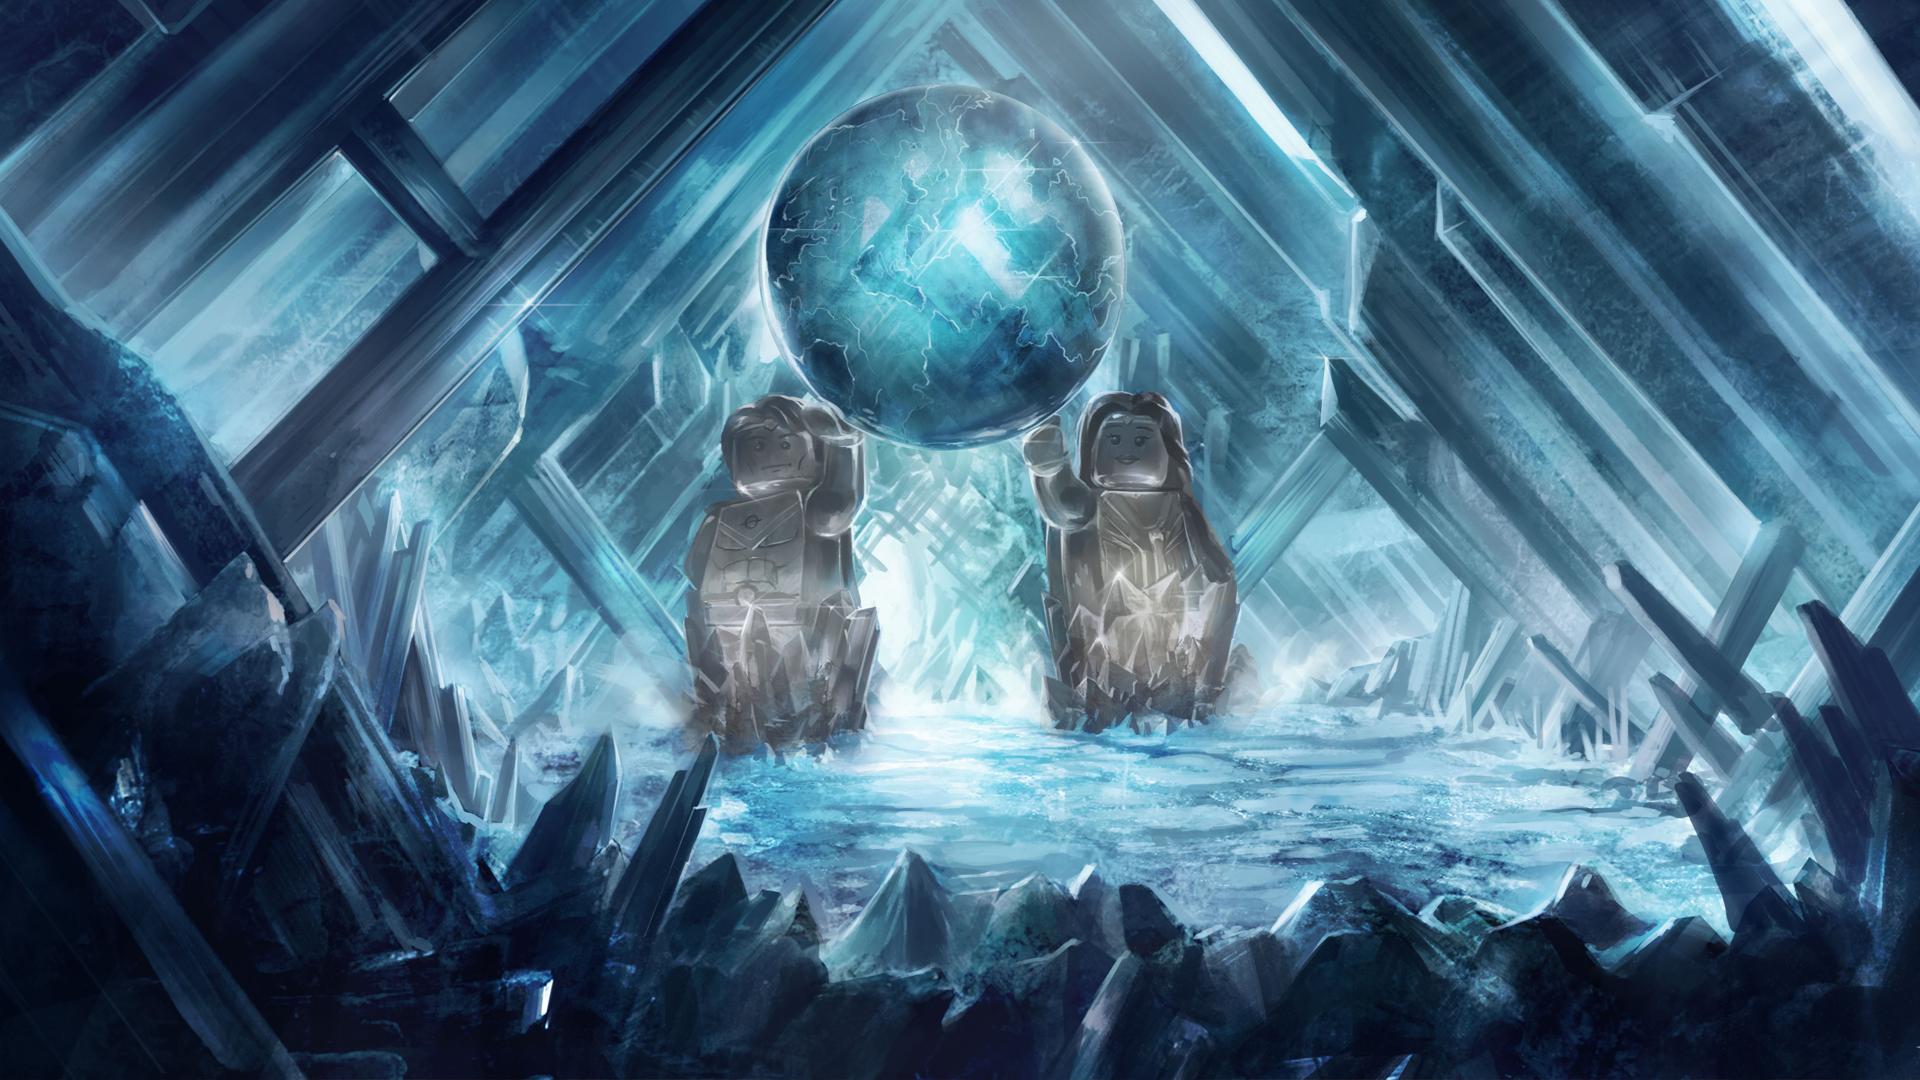 Breaking the Ice